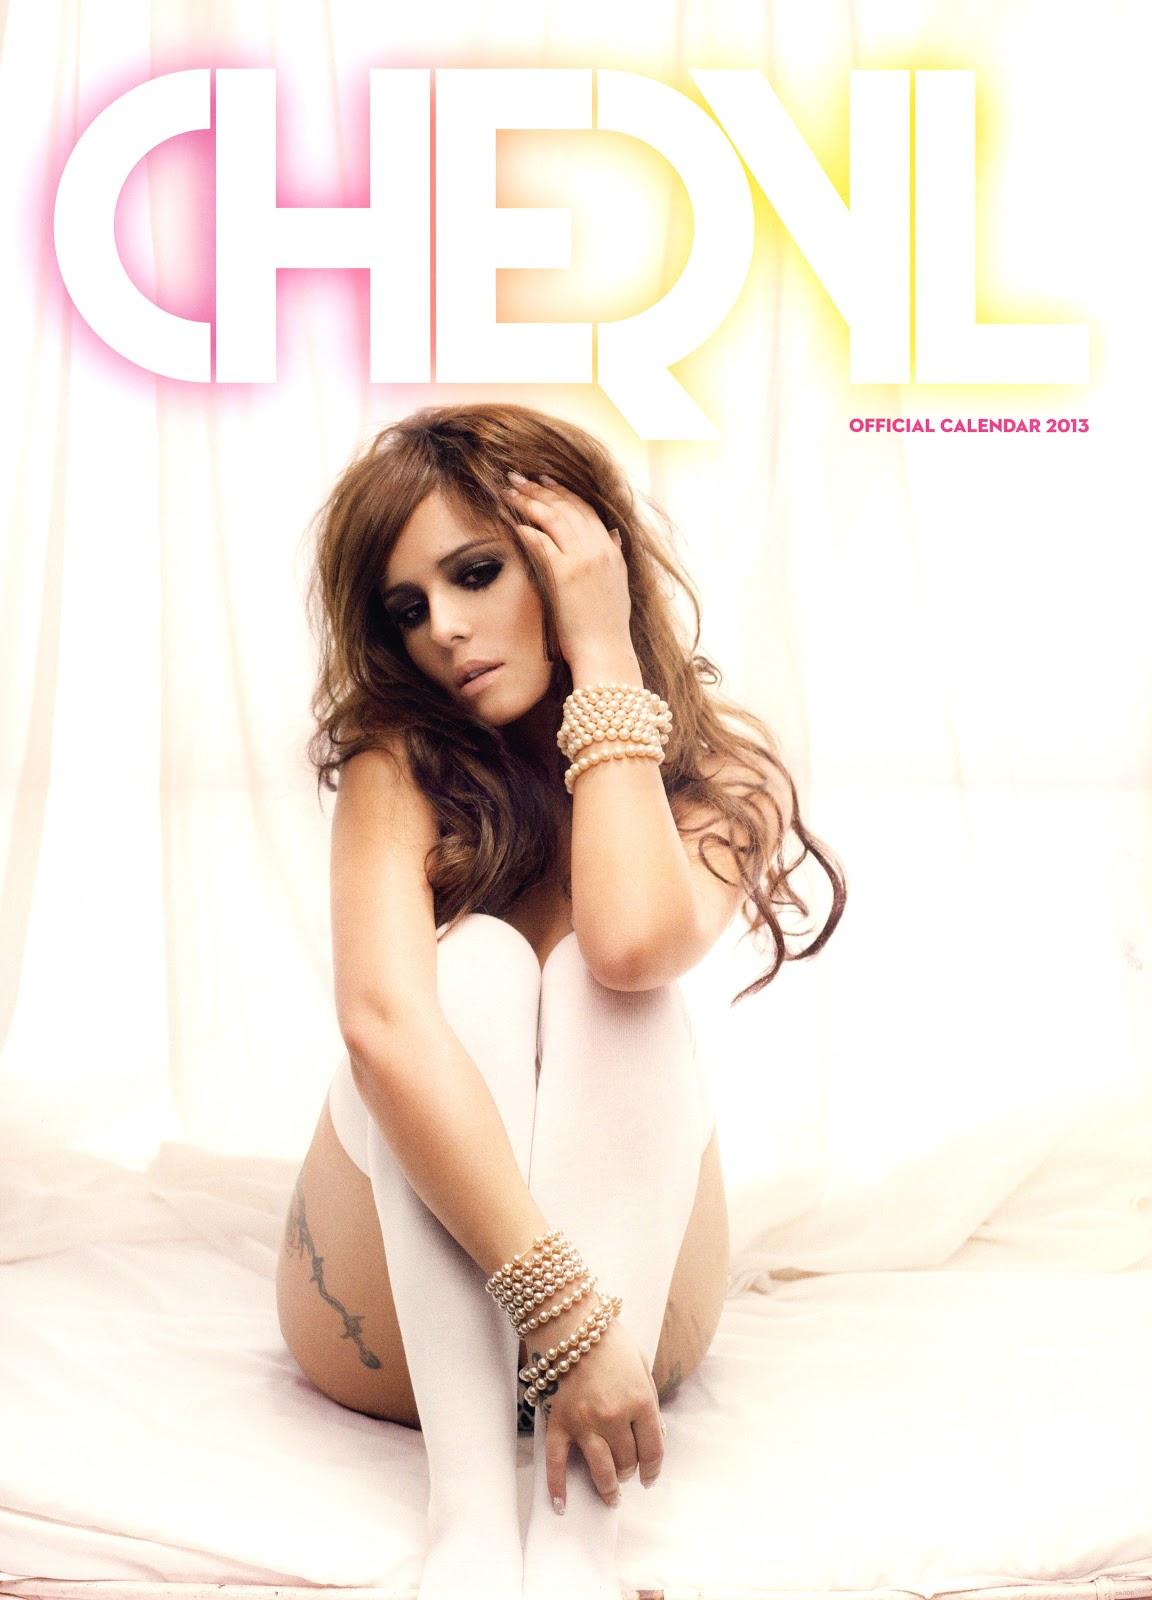 http://4.bp.blogspot.com/-6knjqF_J1zU/UIqQXNWfypI/AAAAAAAAjaU/7wiVRQjylLw/s1600/Cheryl+Cole%252C+looking+sexy+in+her+Official+2013+Calendar+1.jpg